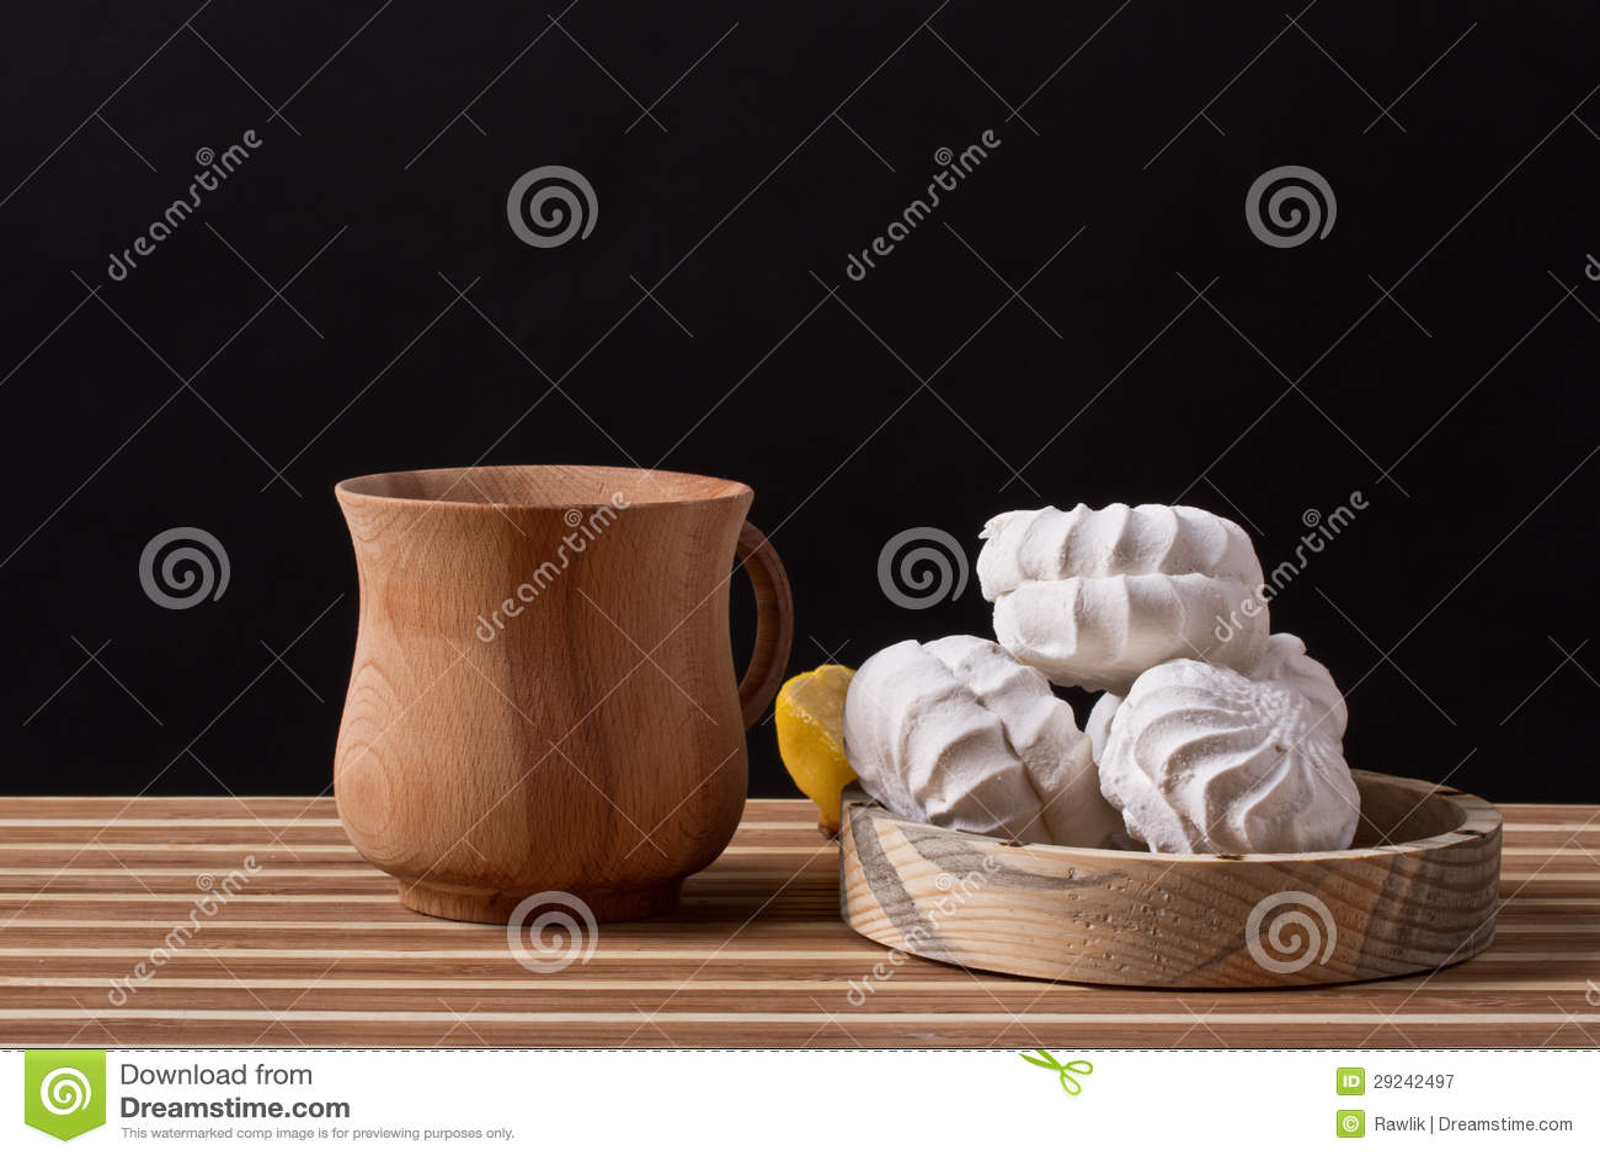 Download Doce do Marshmallow imagem de stock. Imagem de grande - 29242497